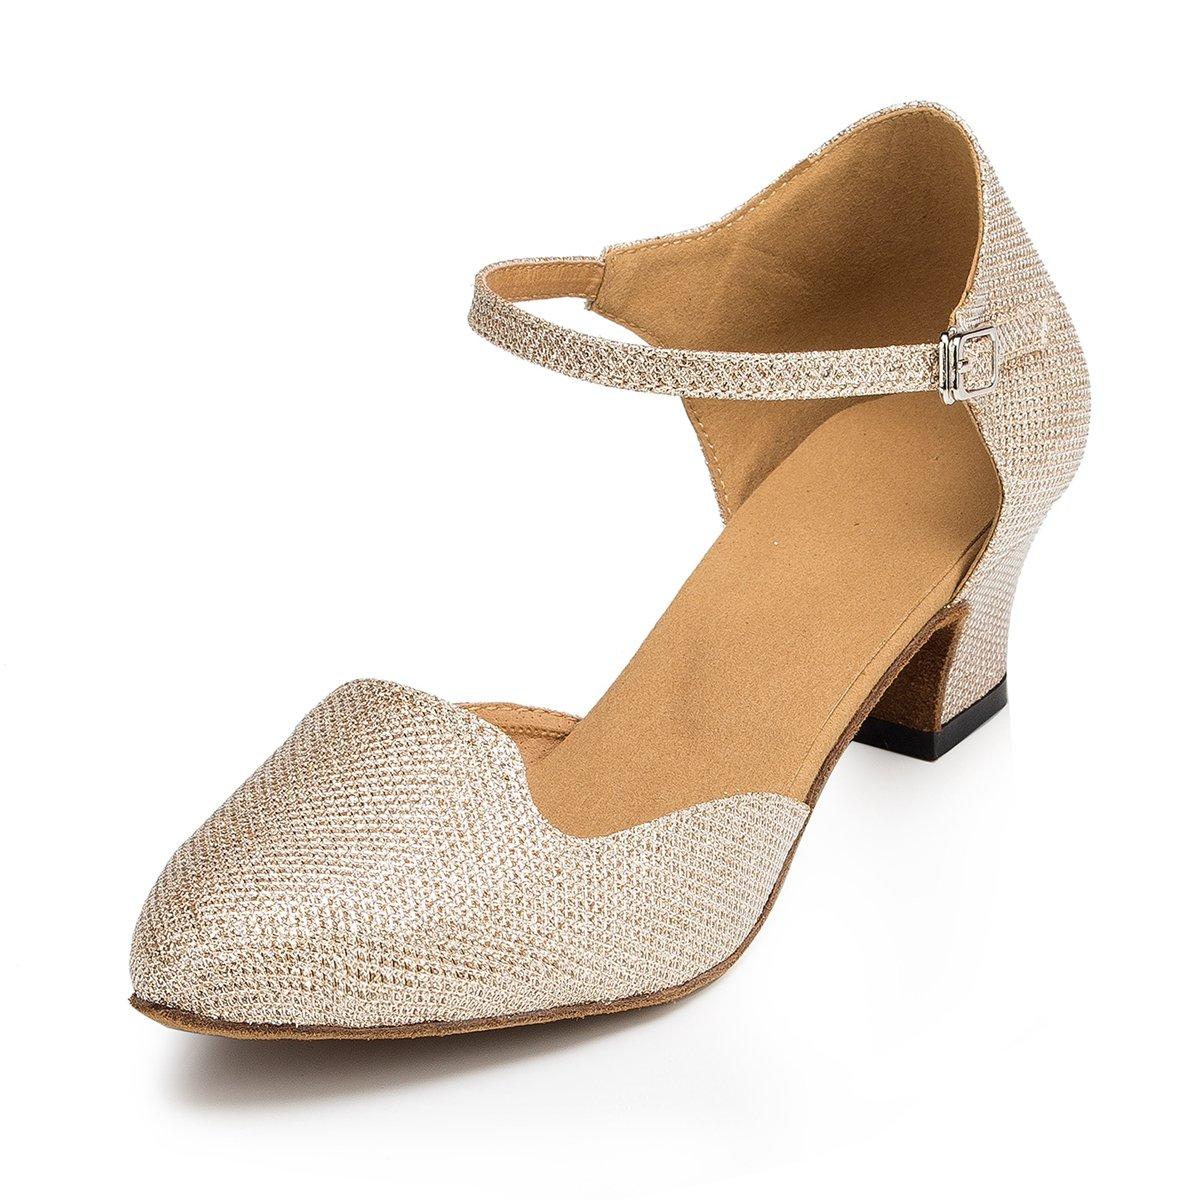 Miyoopark Womens Chunky Low Heel Champagne Glitter Latin Salsa Dance Shoes Wedding Evening Pumps US 8